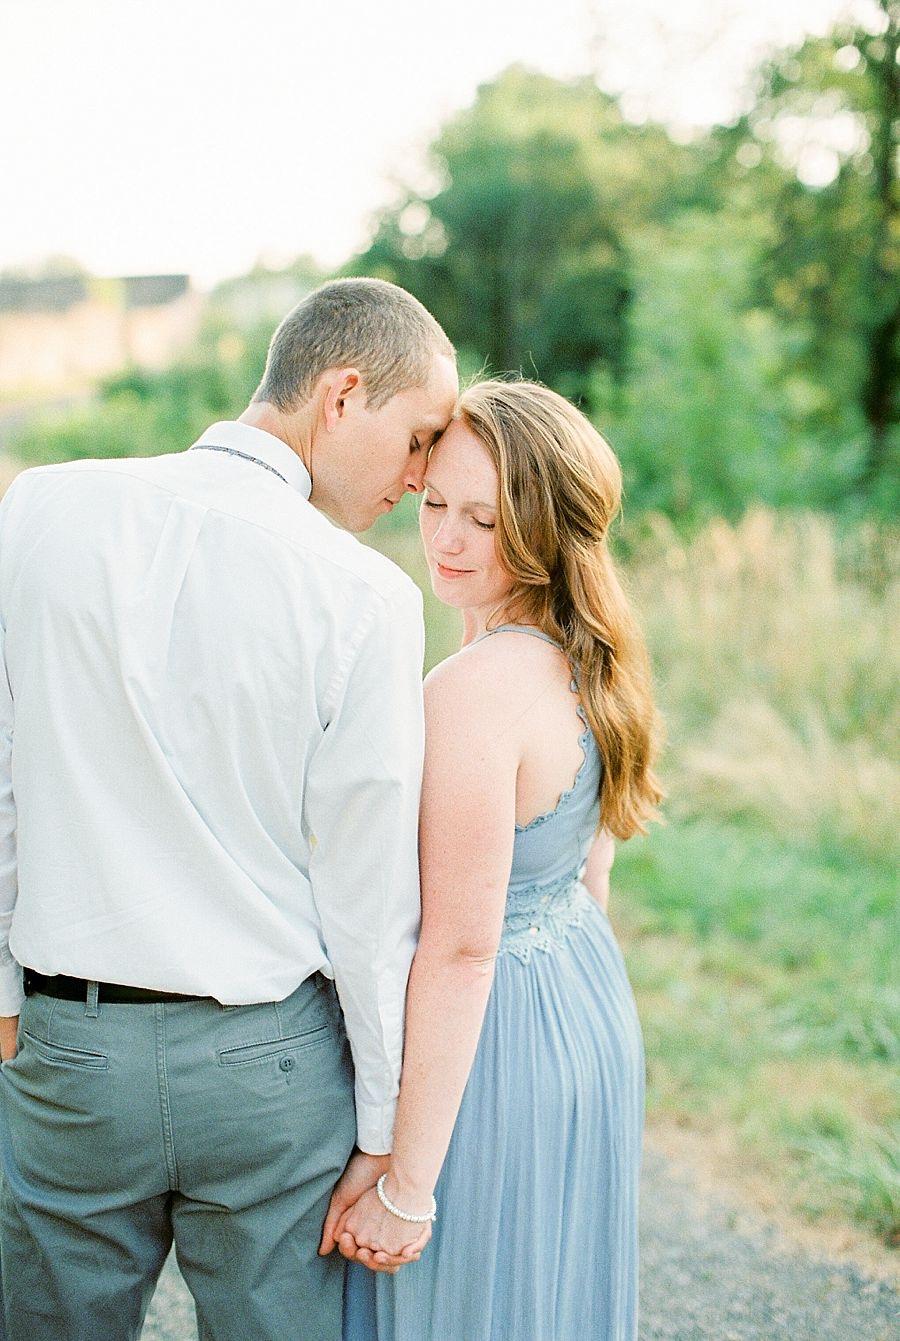 Best Real Love Stories Blog